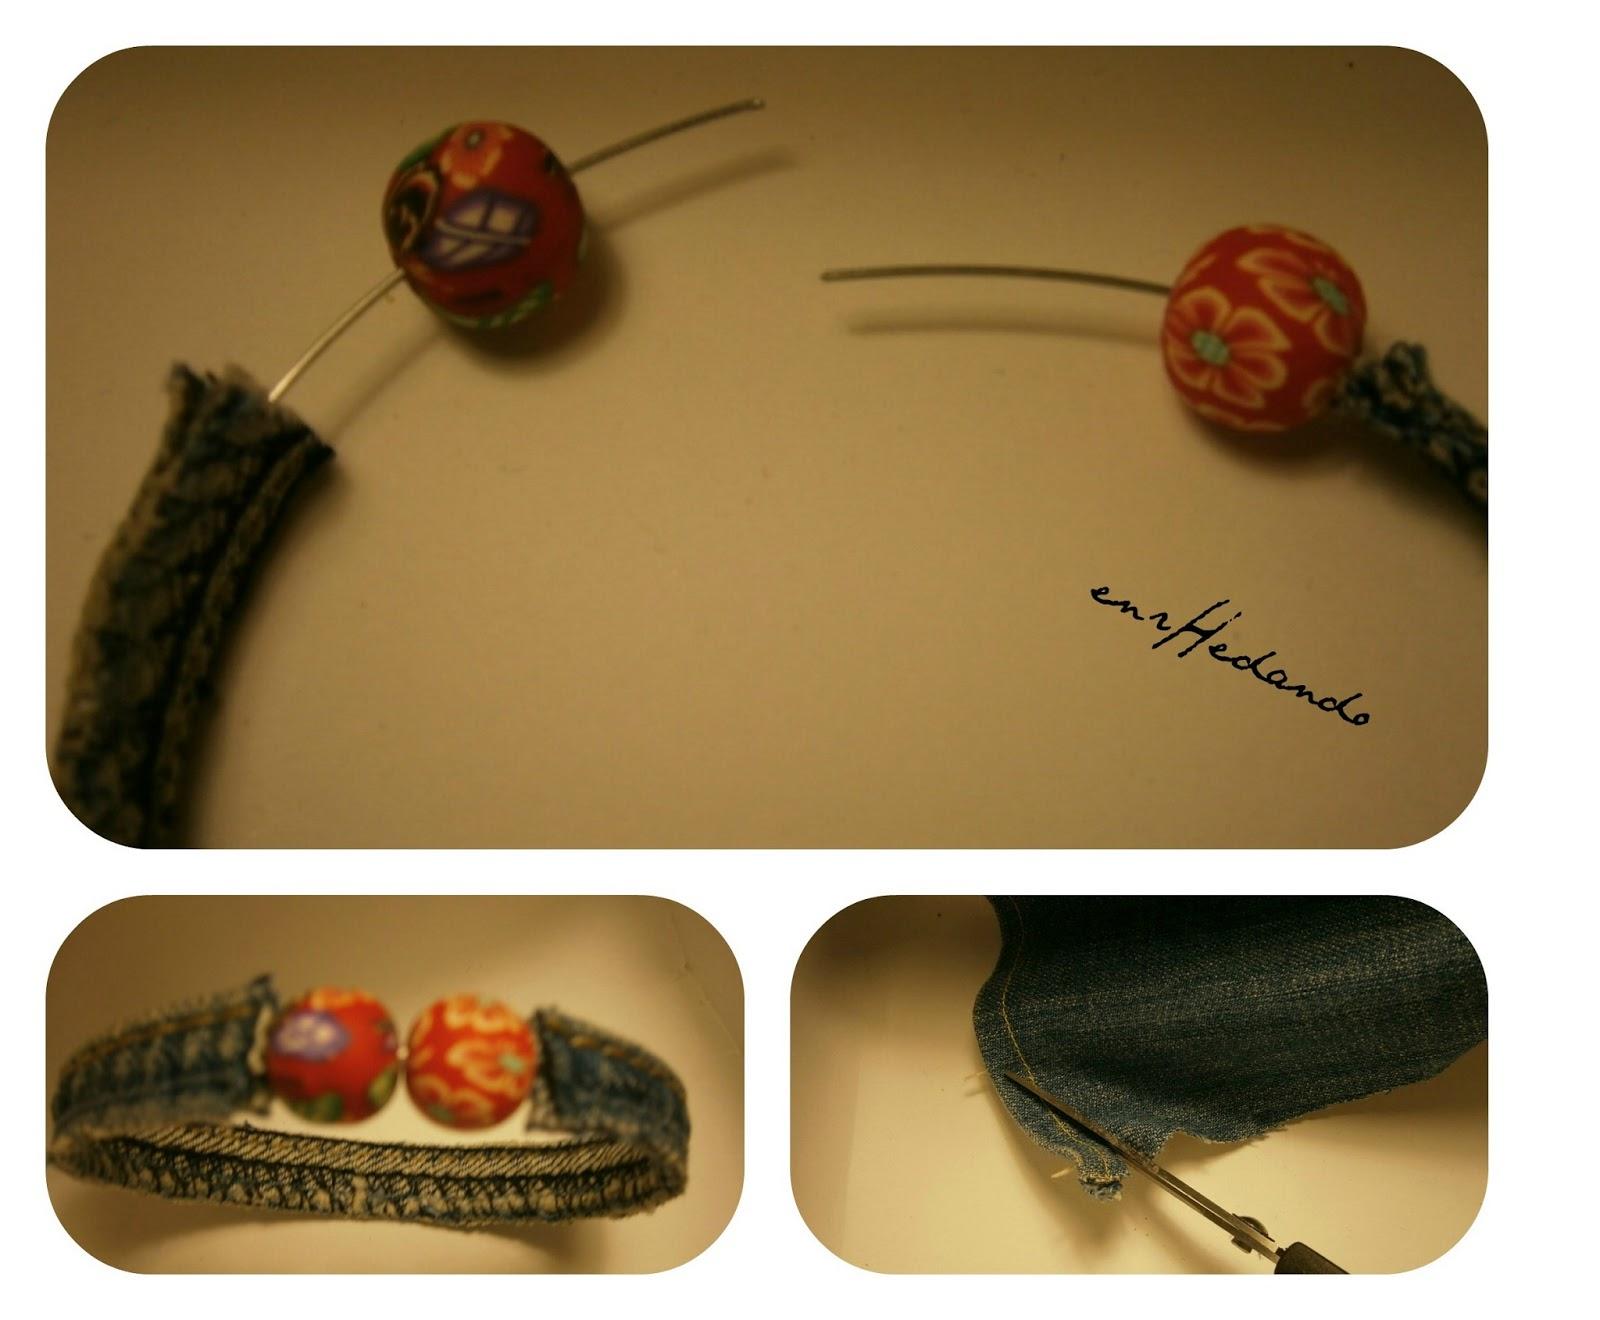 pulseras, vaqueras, alfabeto morse, diys bracelets with denim fabric